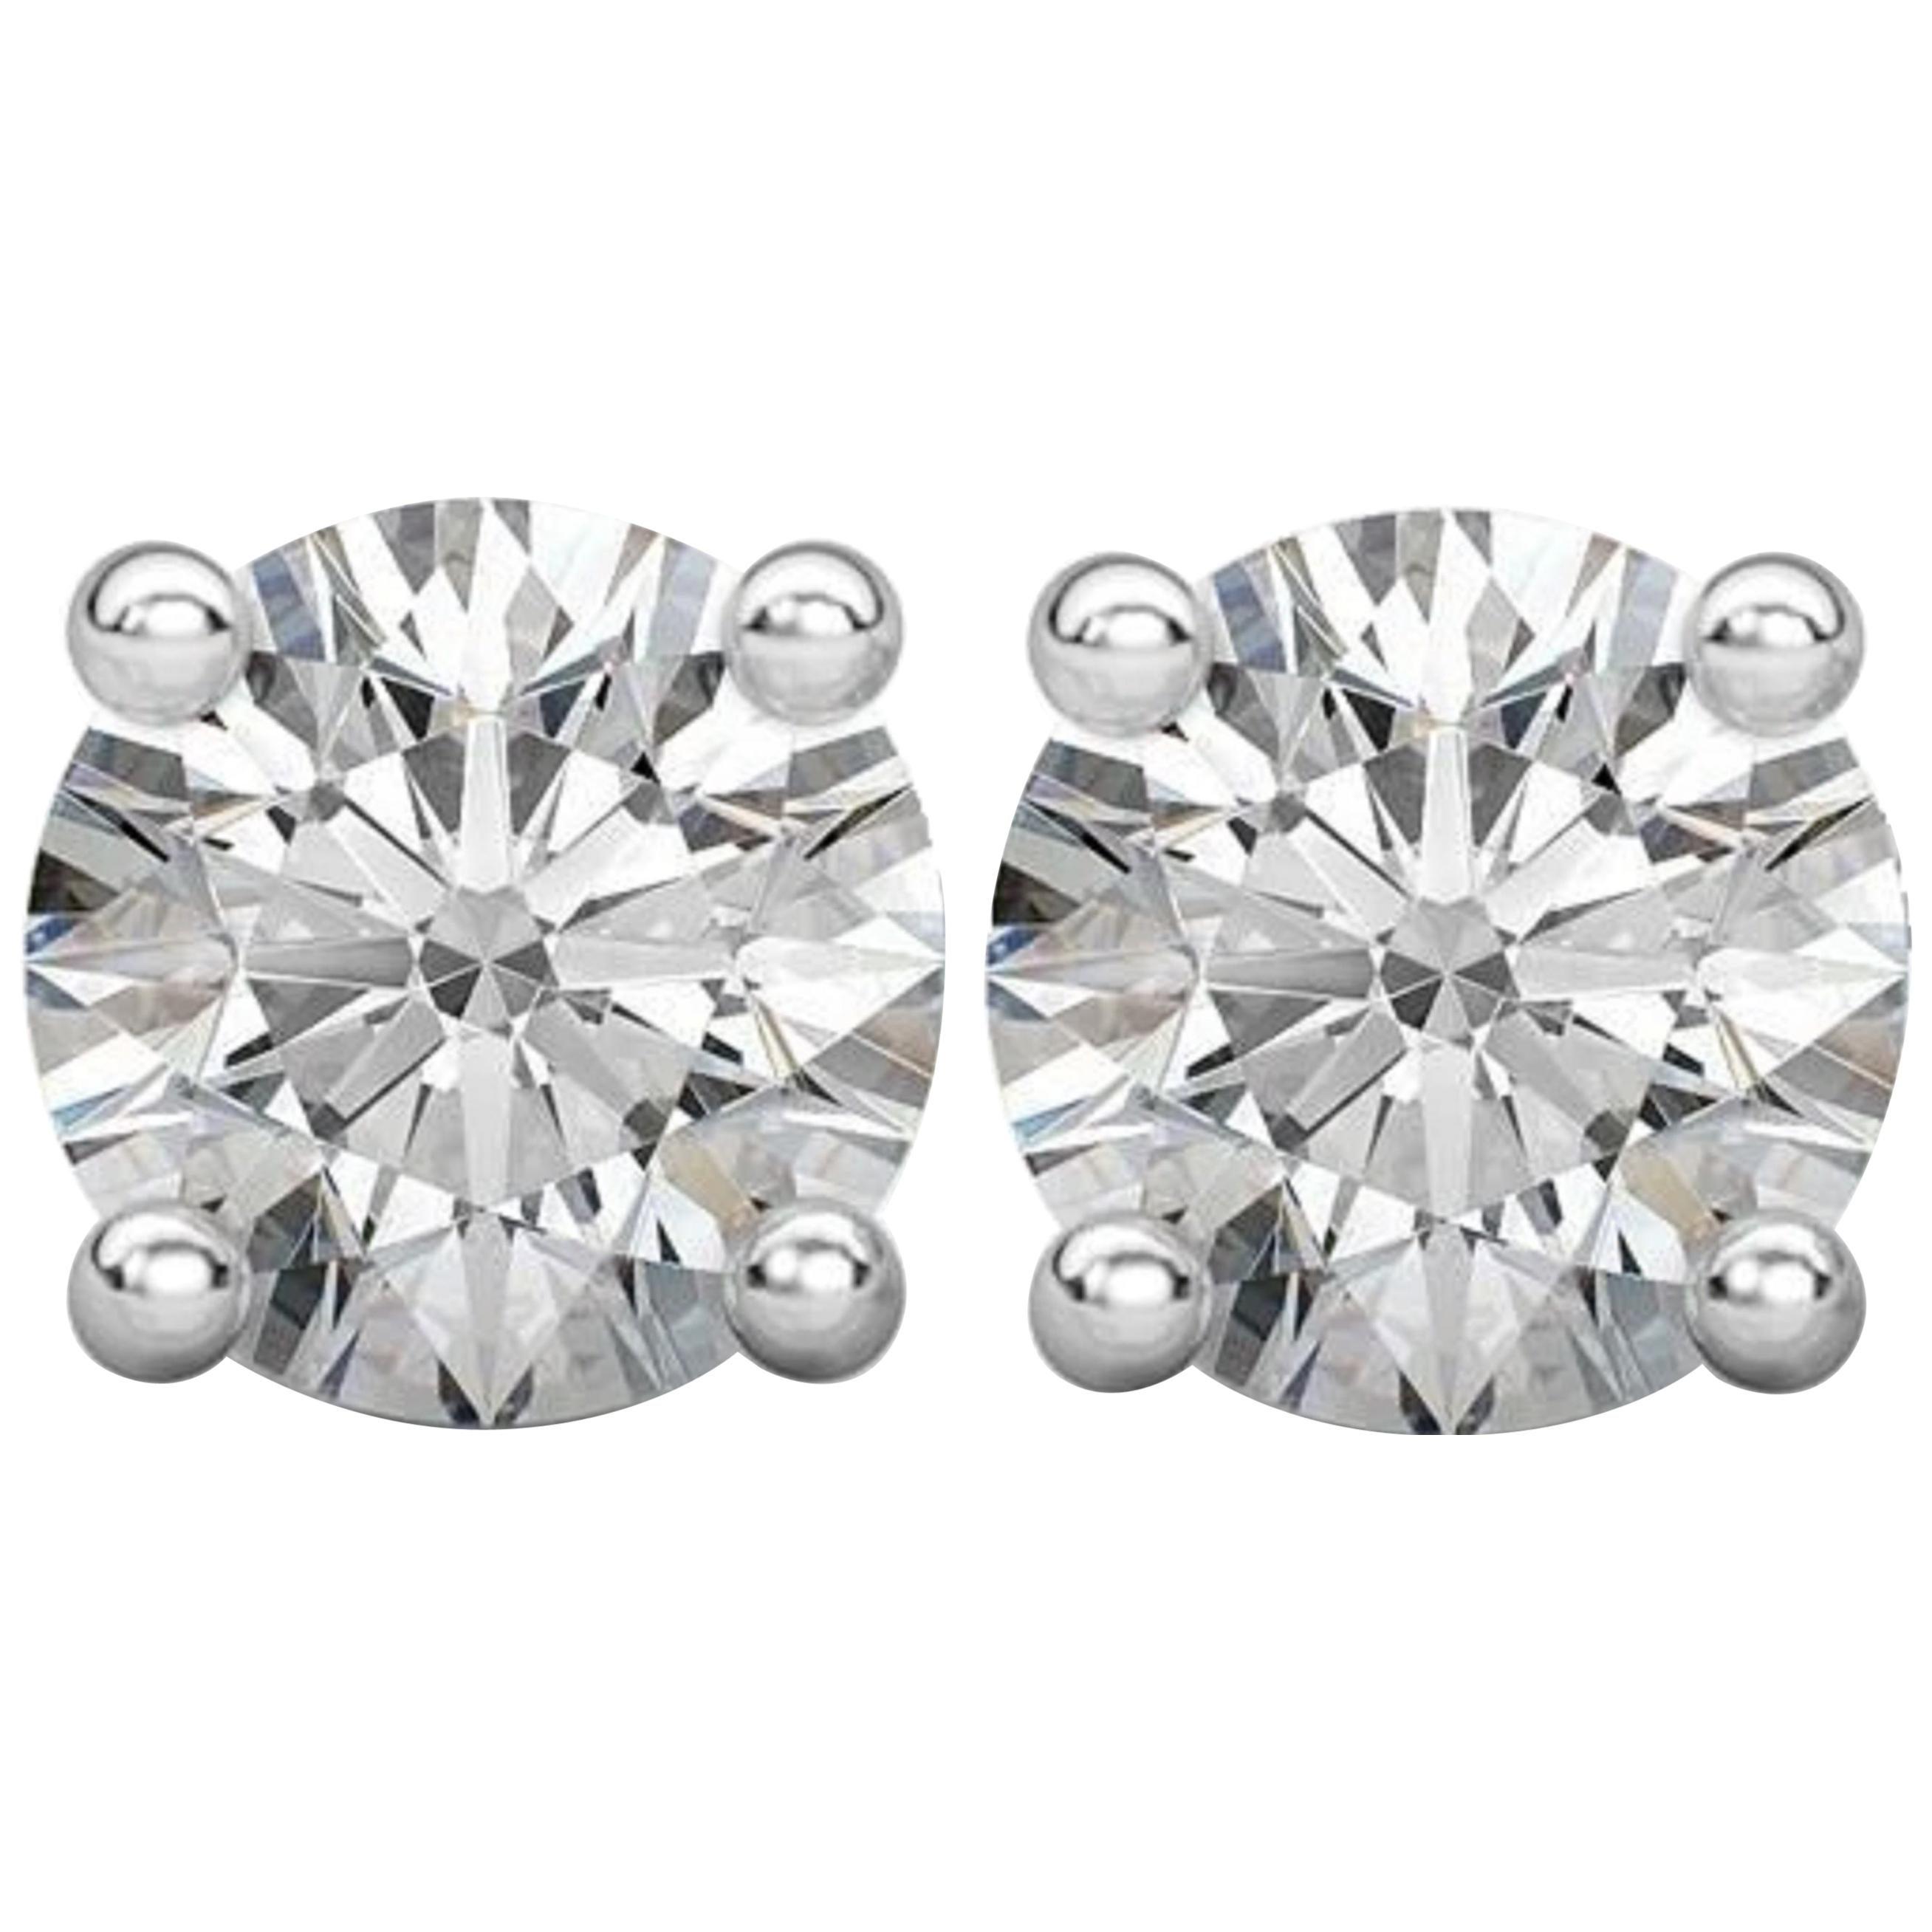 Internally Flawless D Color GIA Certified 1.80 Carat Diamond Studs